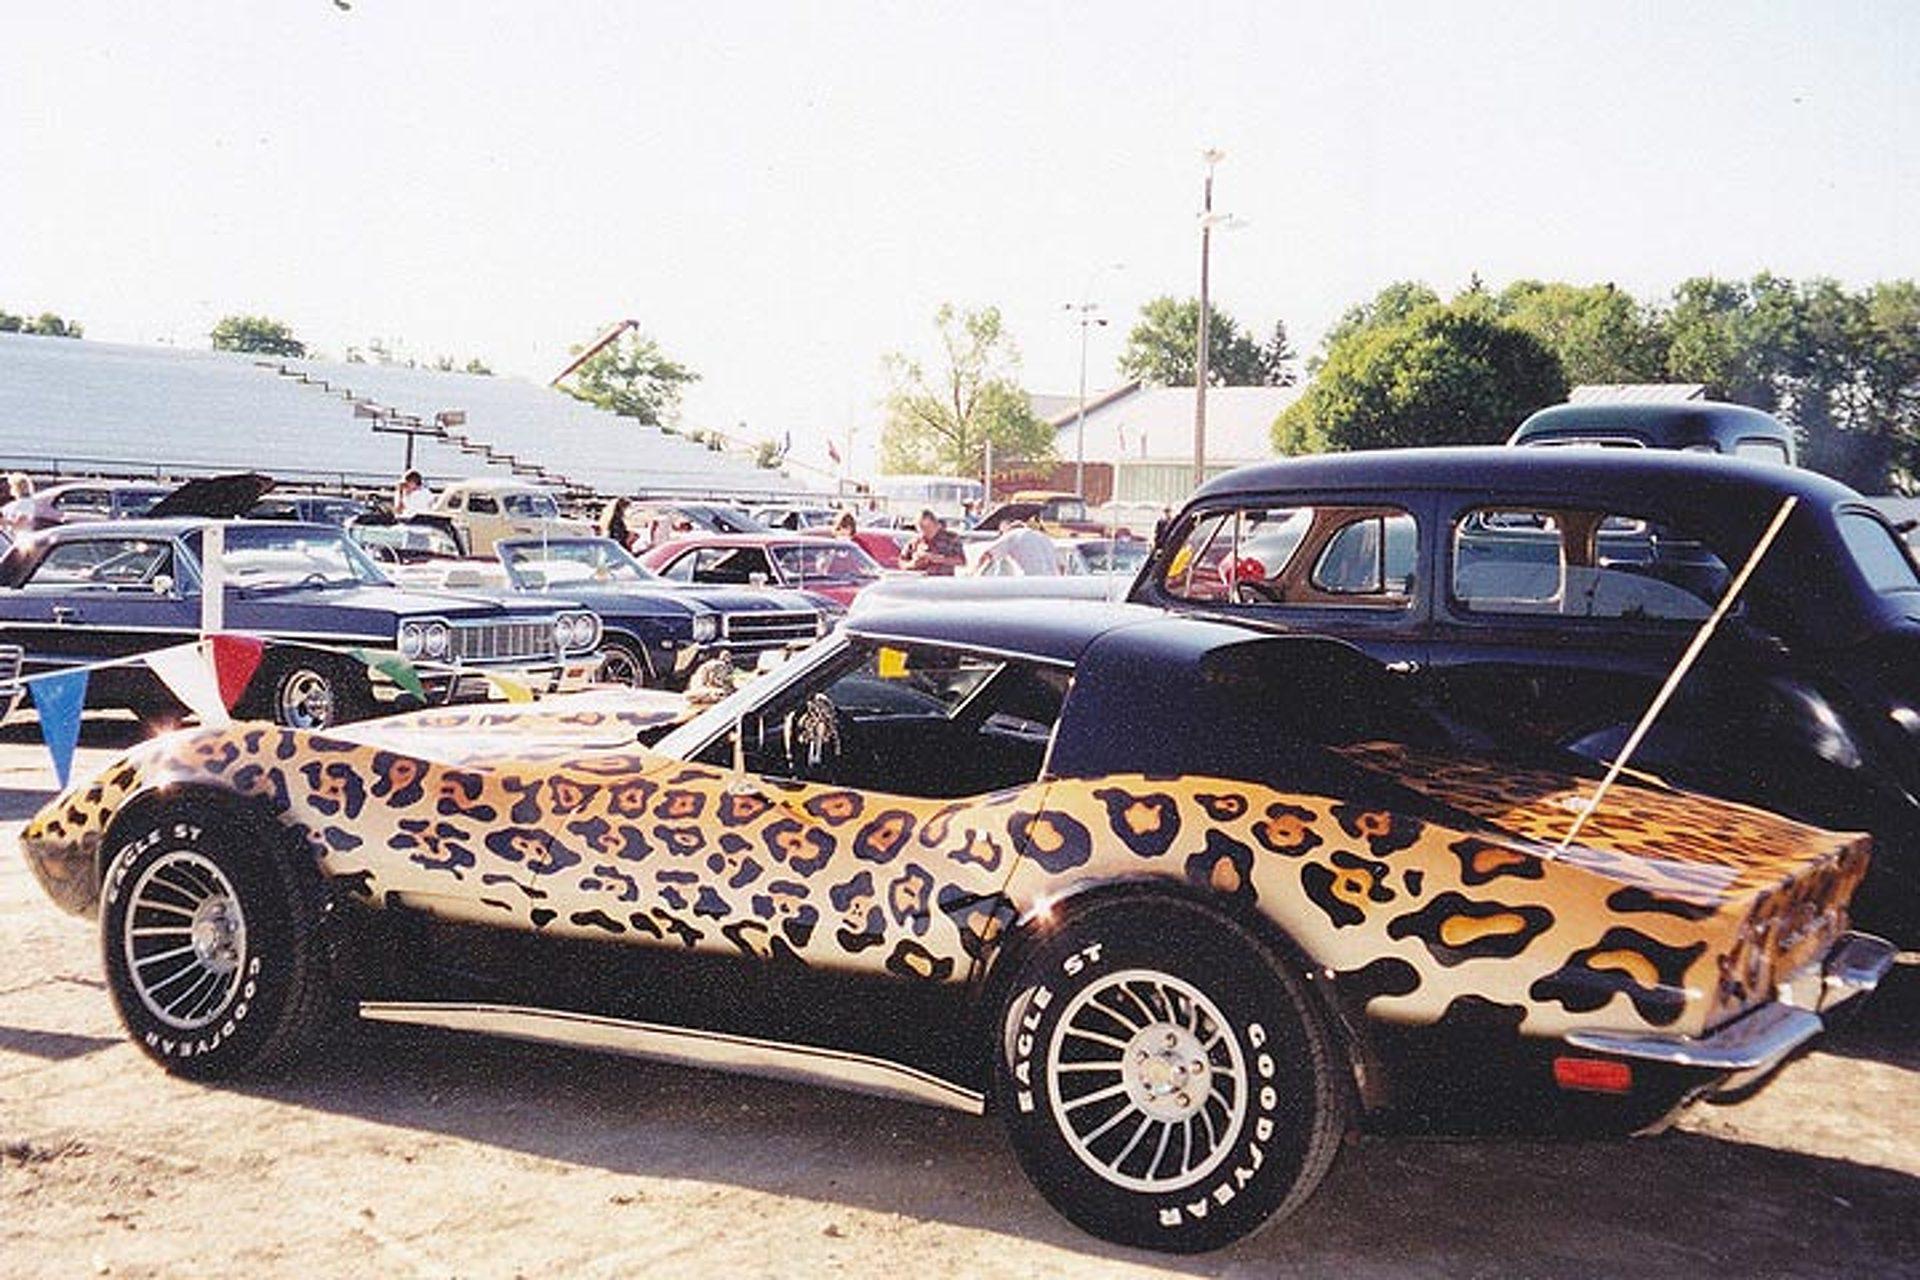 Forget the Stingray, This Corvette is a Jaguar!